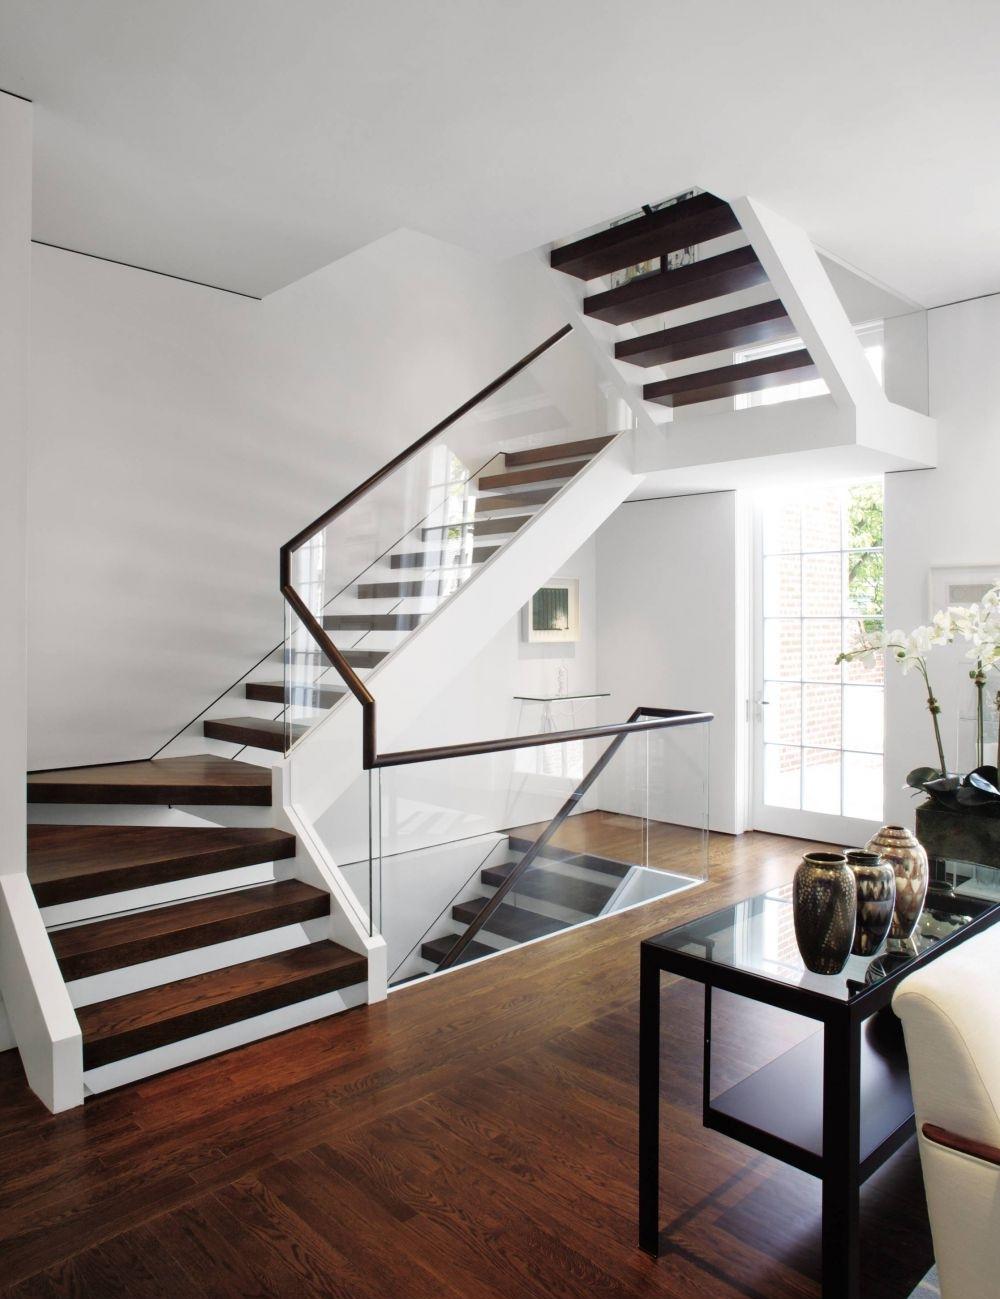 Дизайн коридора с лестницей в стиле этно